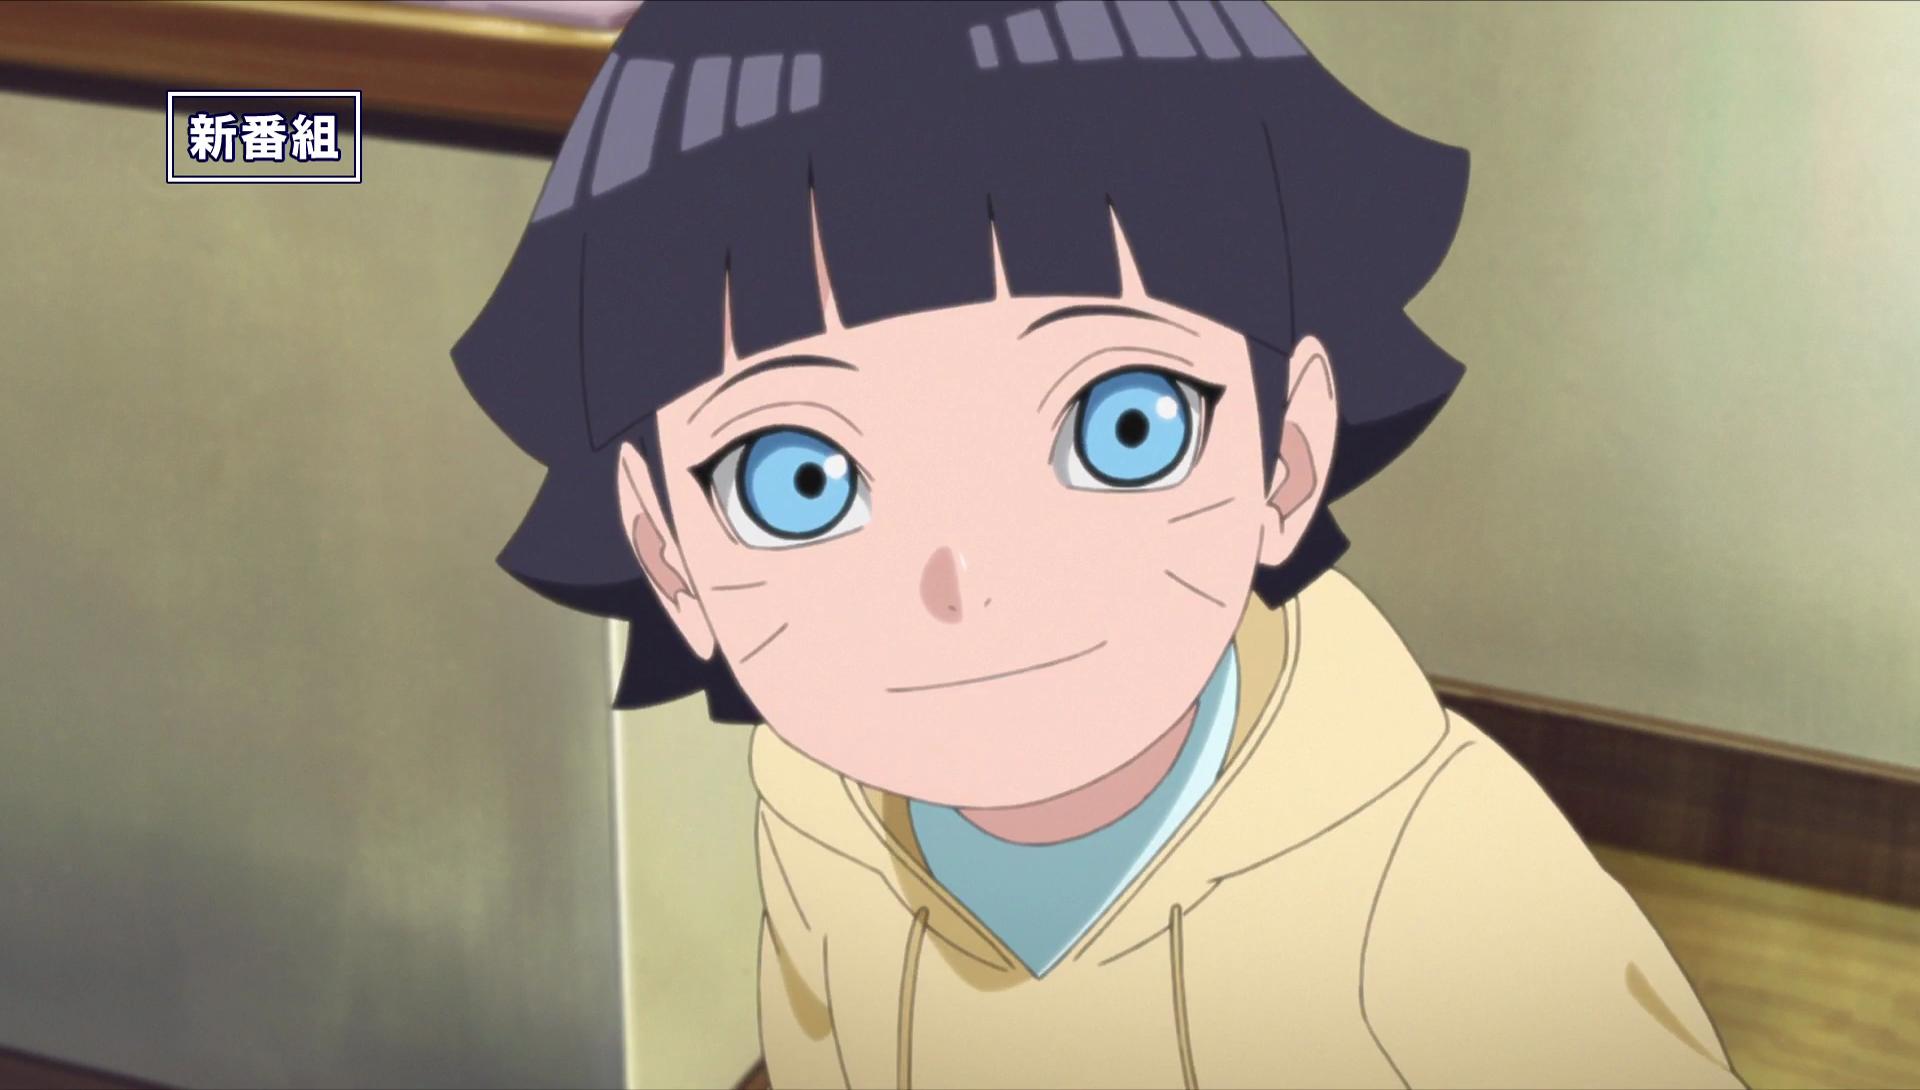 Boruto -Naruto Next Generations PV 2 - 6 by AiKawaiiChan